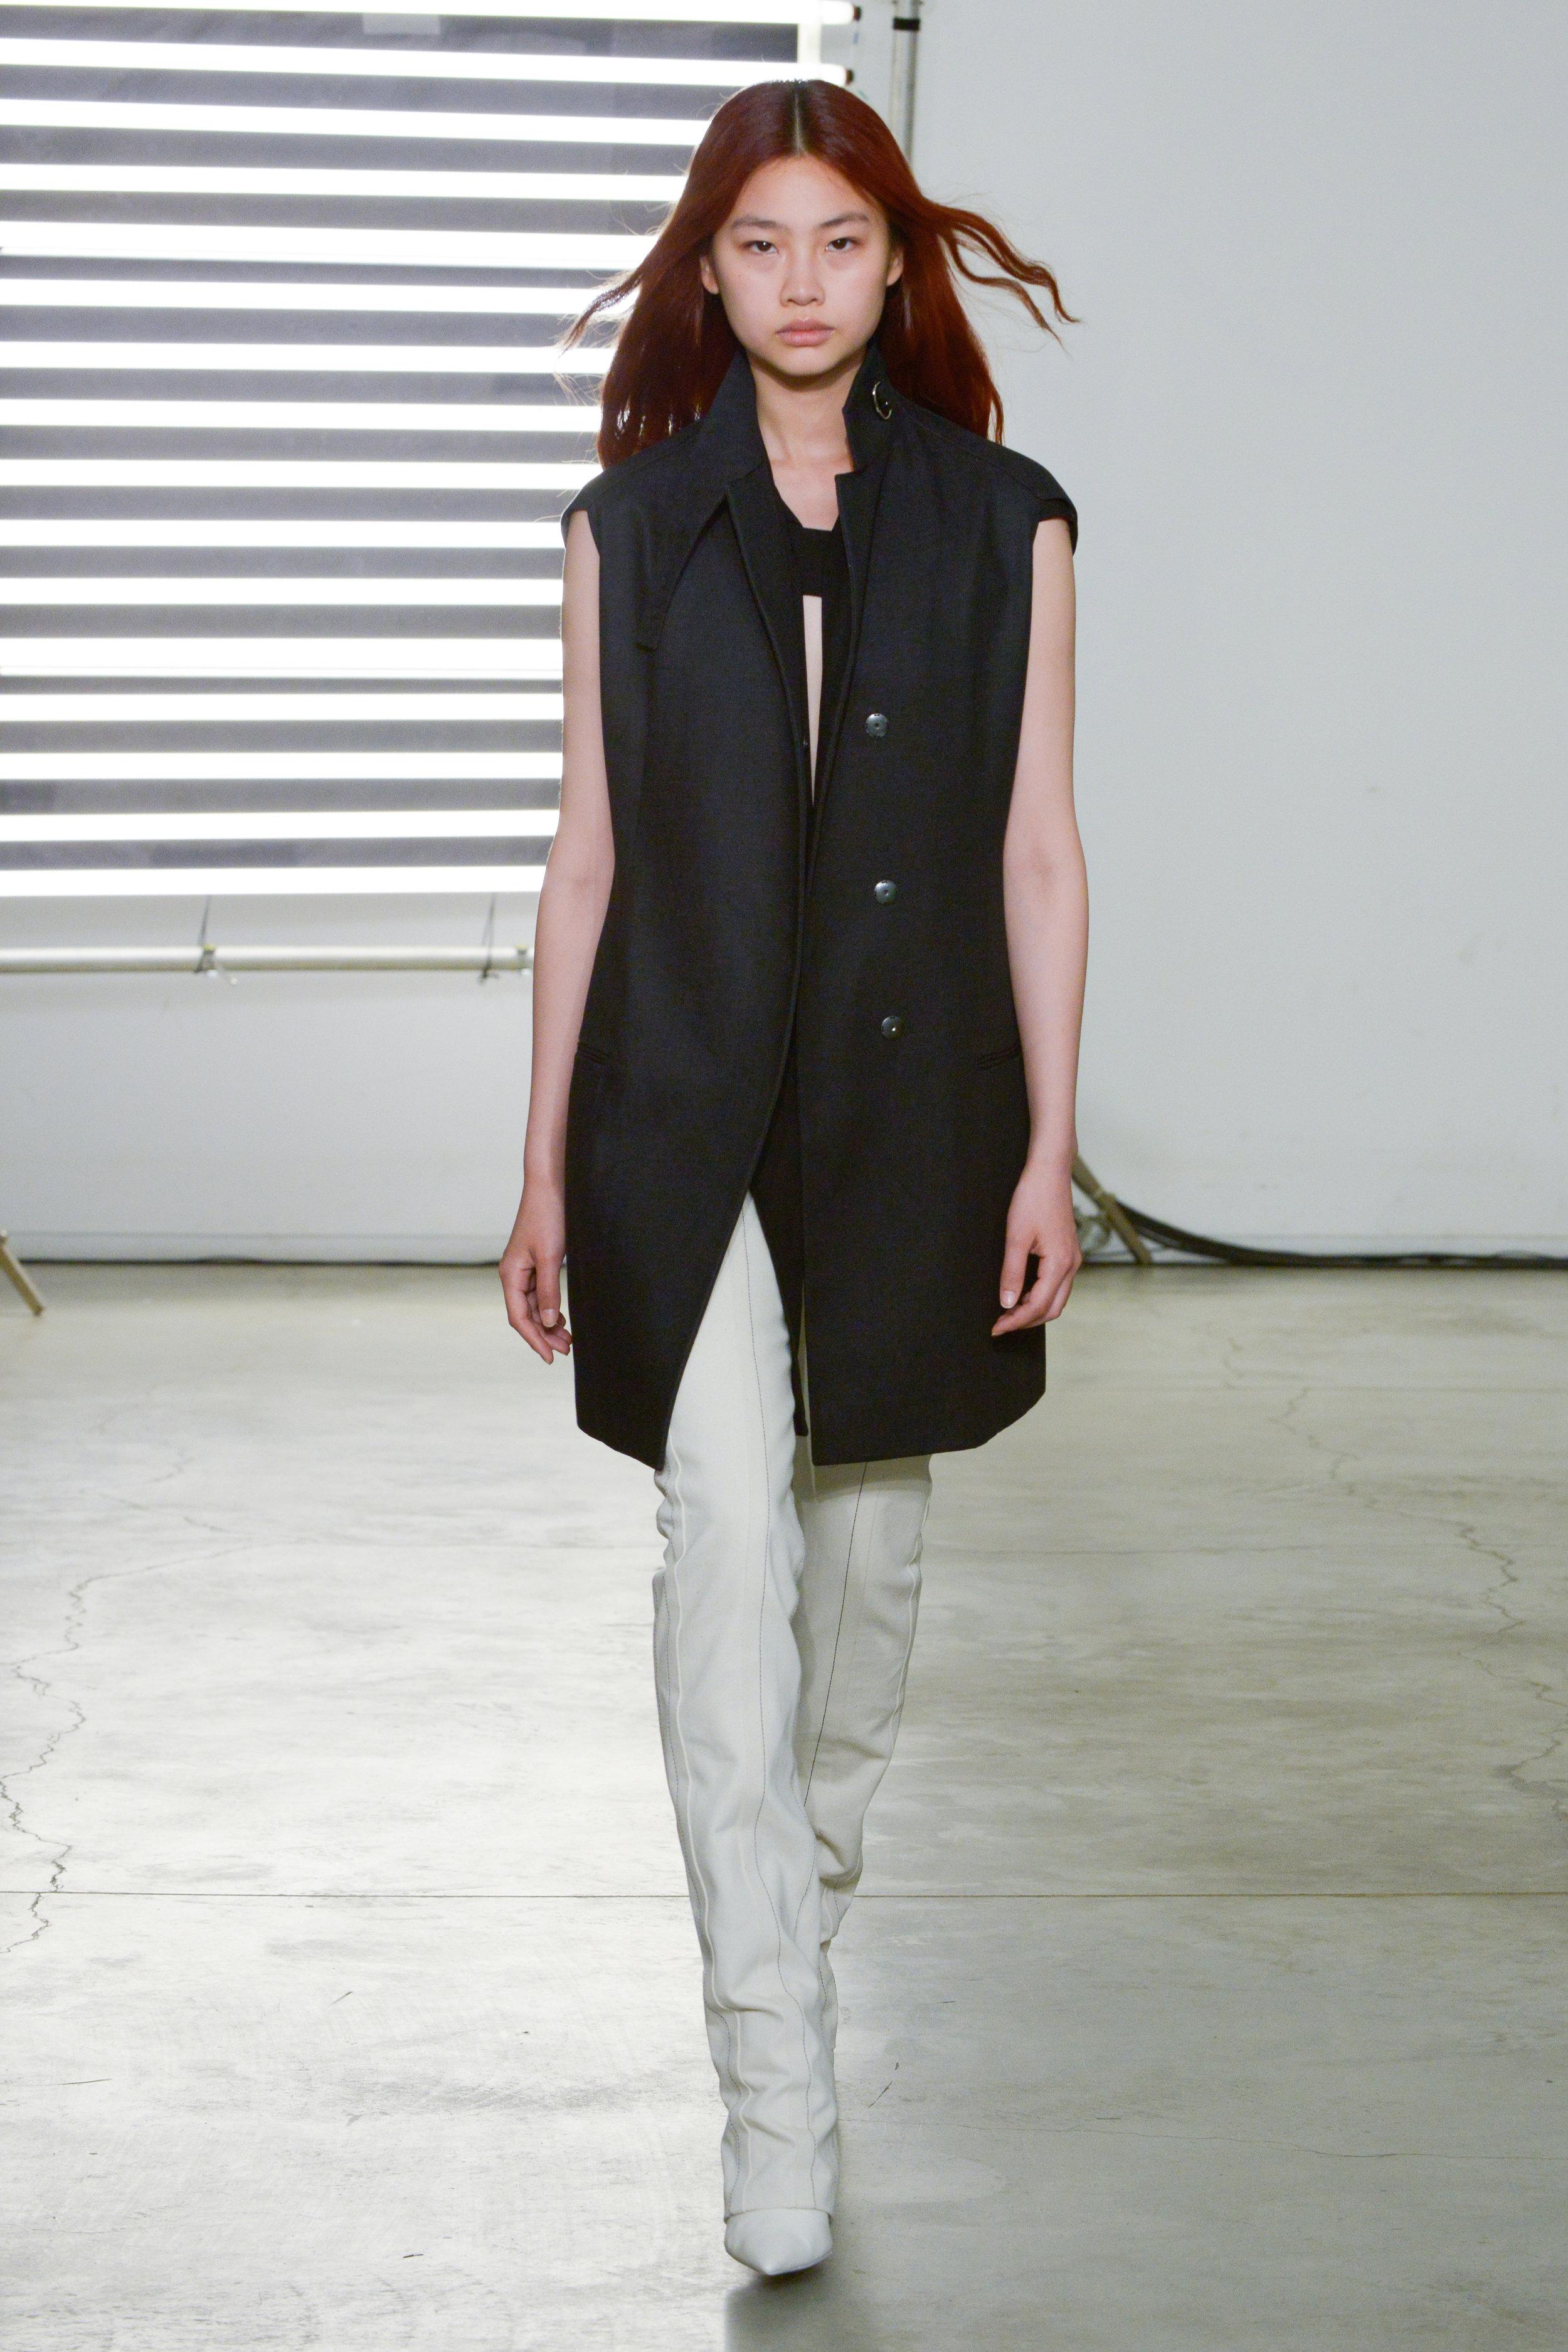 Look 5 Grey/black denim sleeveless jacket over black crepe top with natural denim pant.